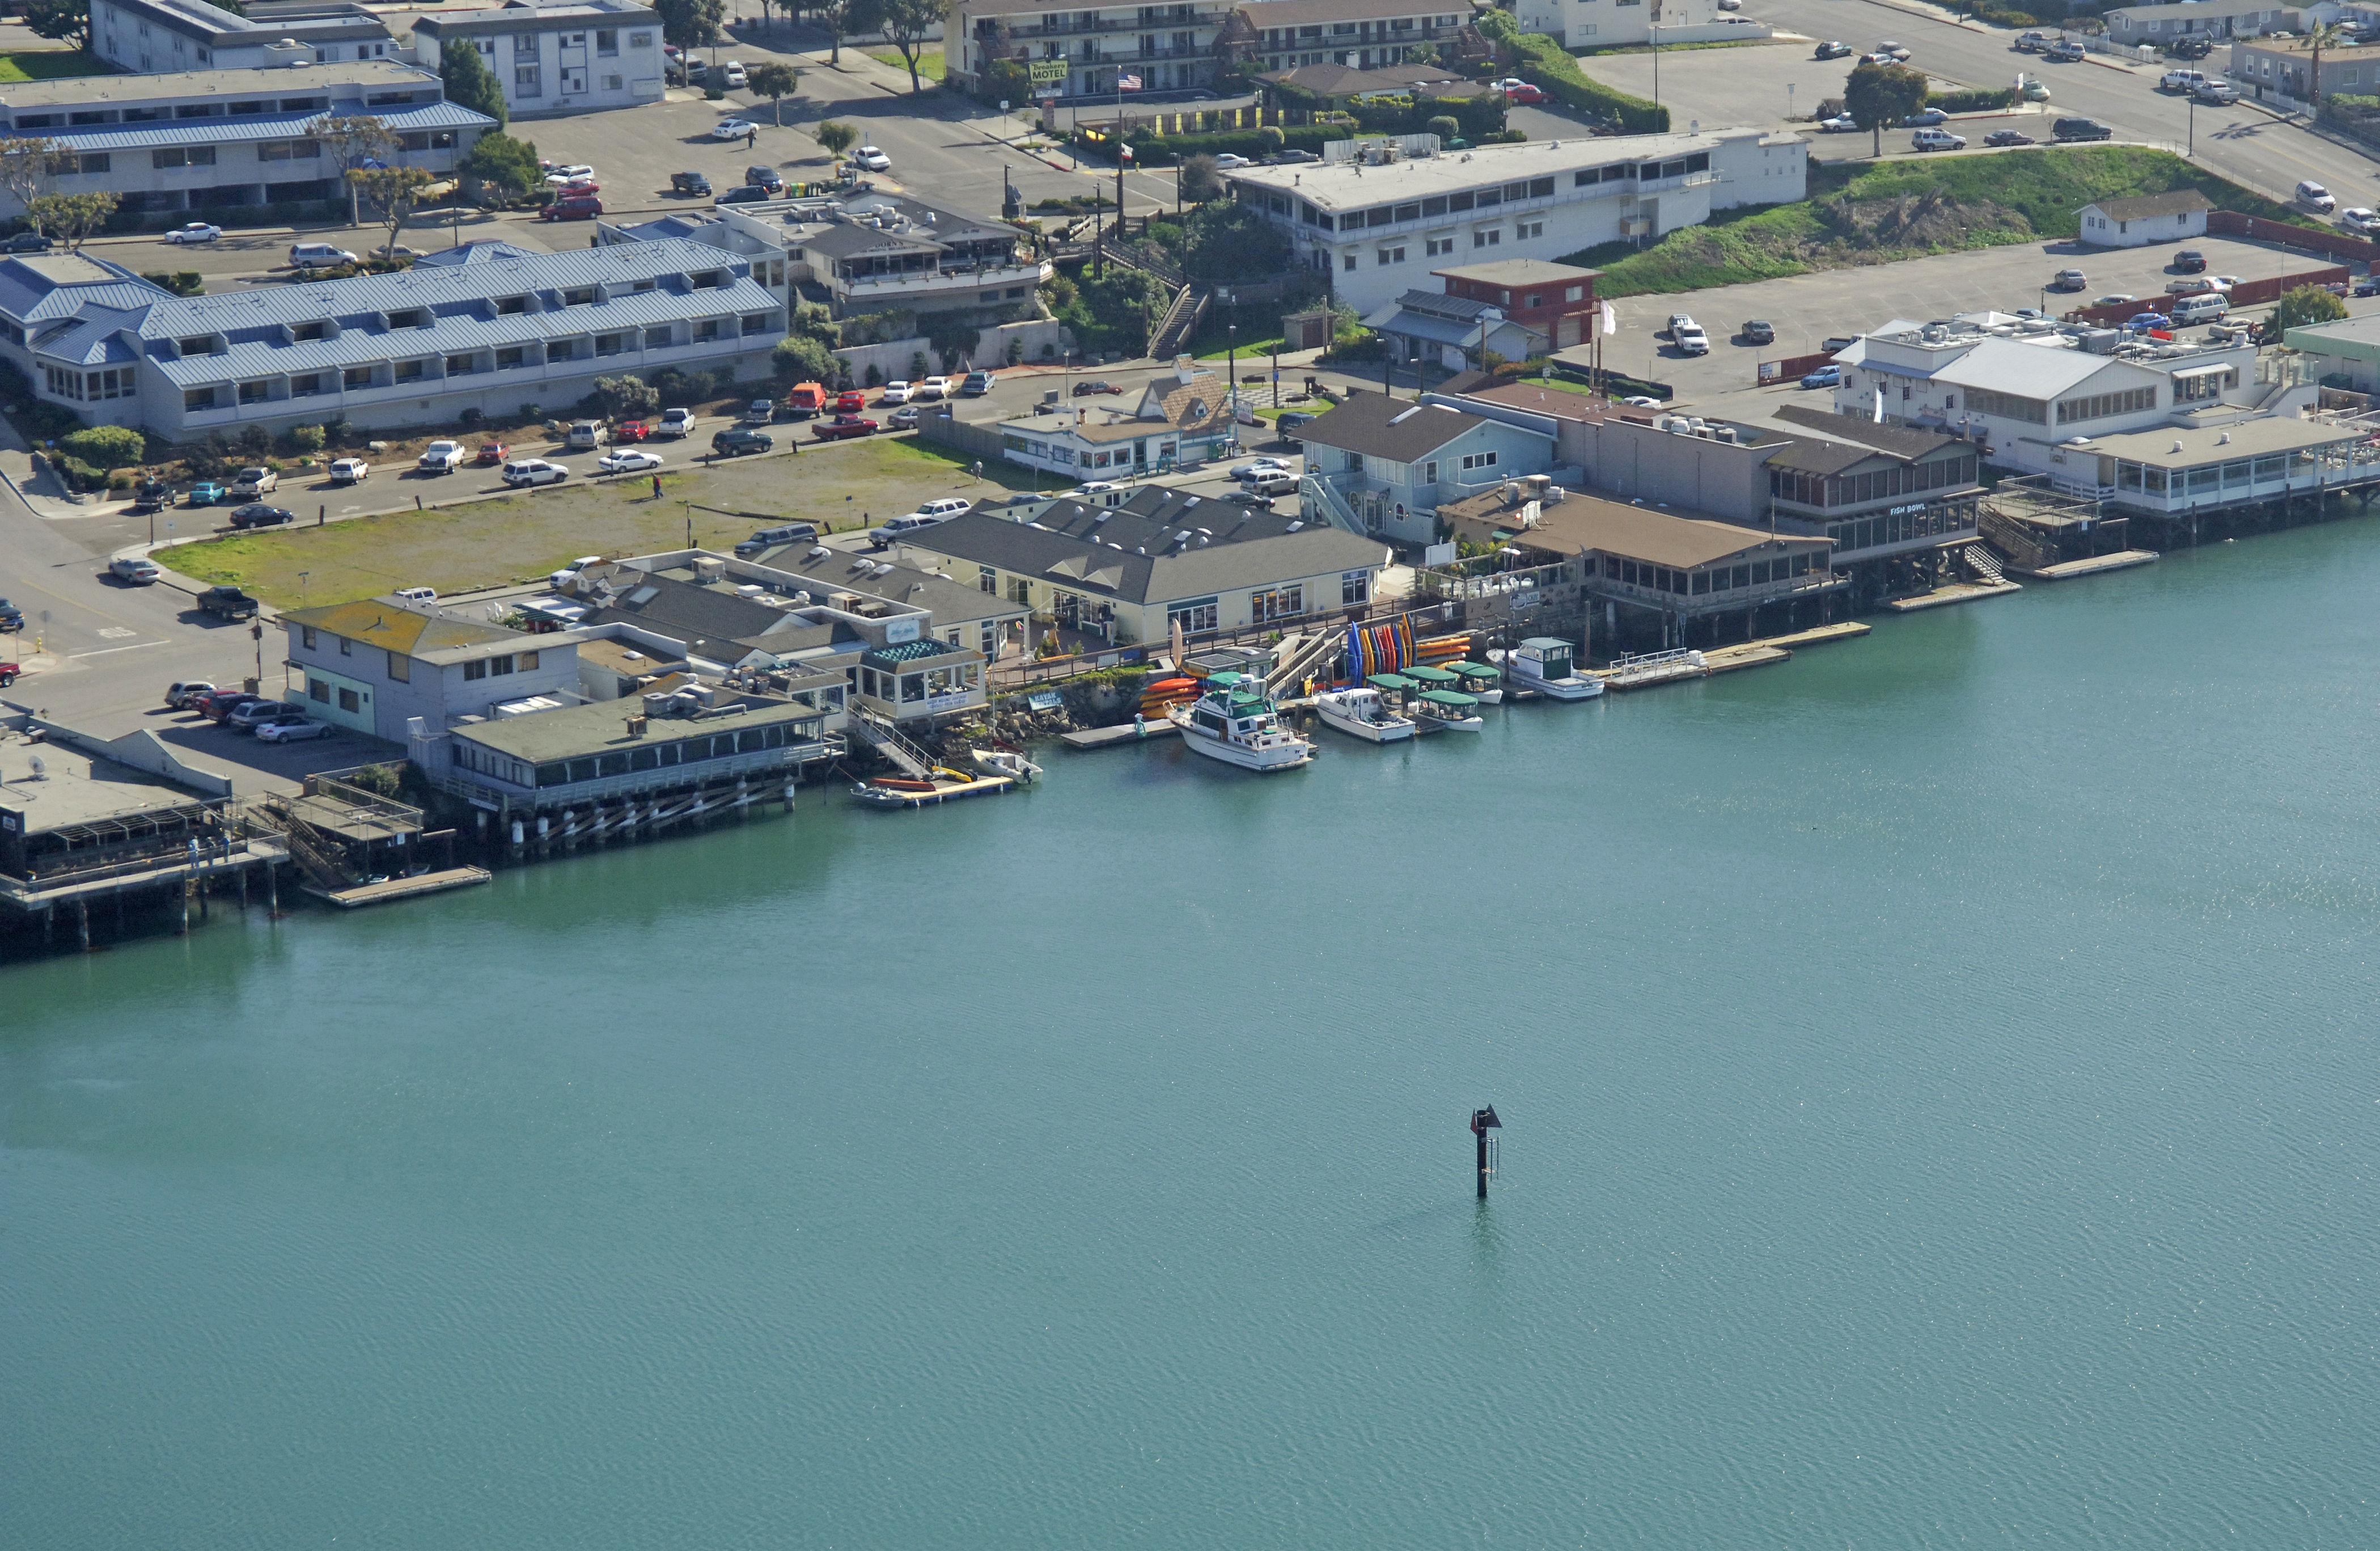 Morro Bay Boatyard In Morro Bay Ca United States